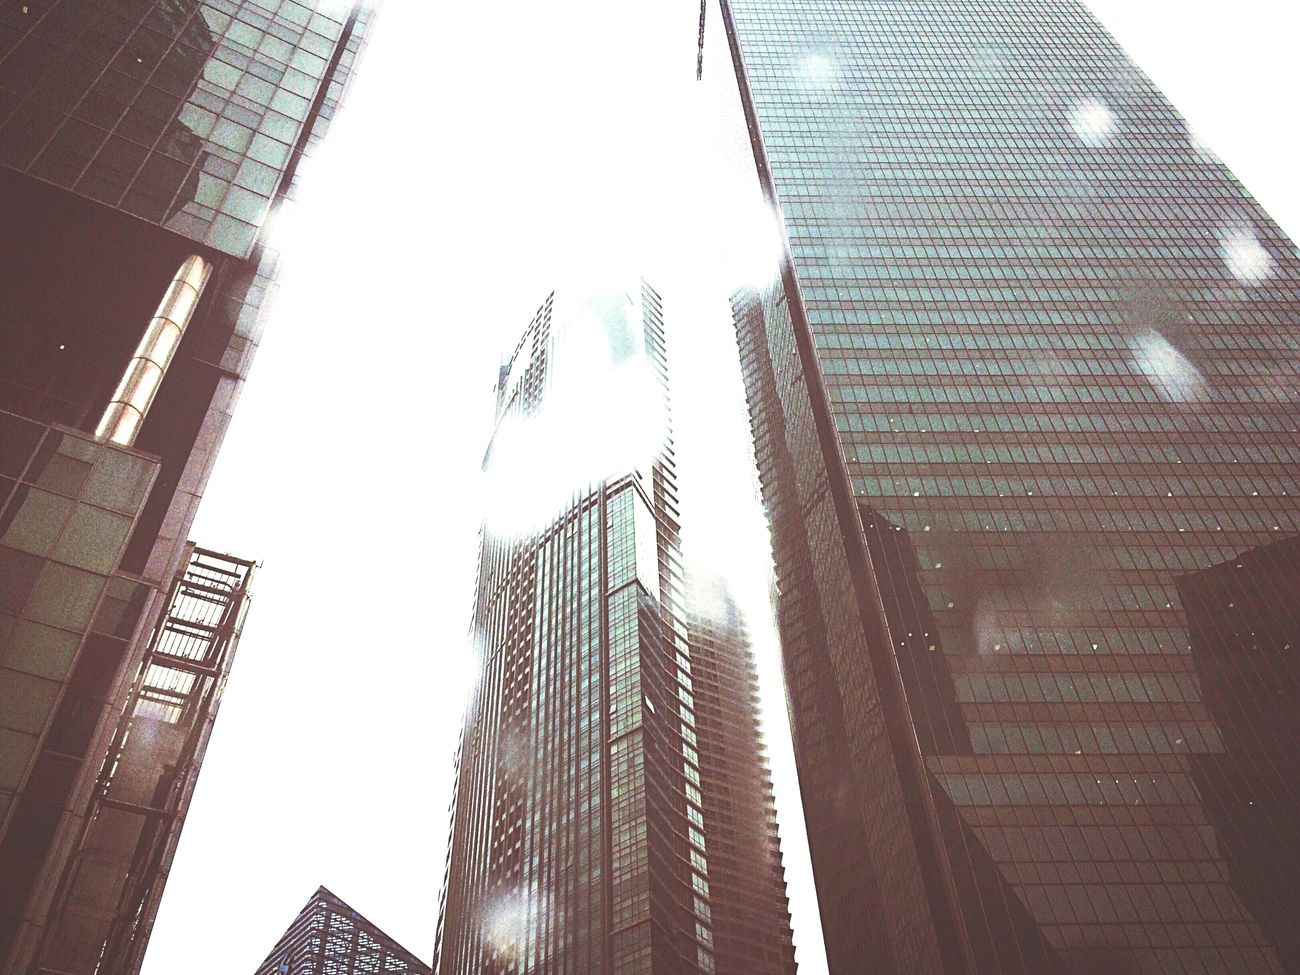 Creative Light And Shadow Open Edit Architecture Streetphotography Urbanphotography Urban Geometry Eye4photography  EyeEm Best Shots Urban Landscape Exploring